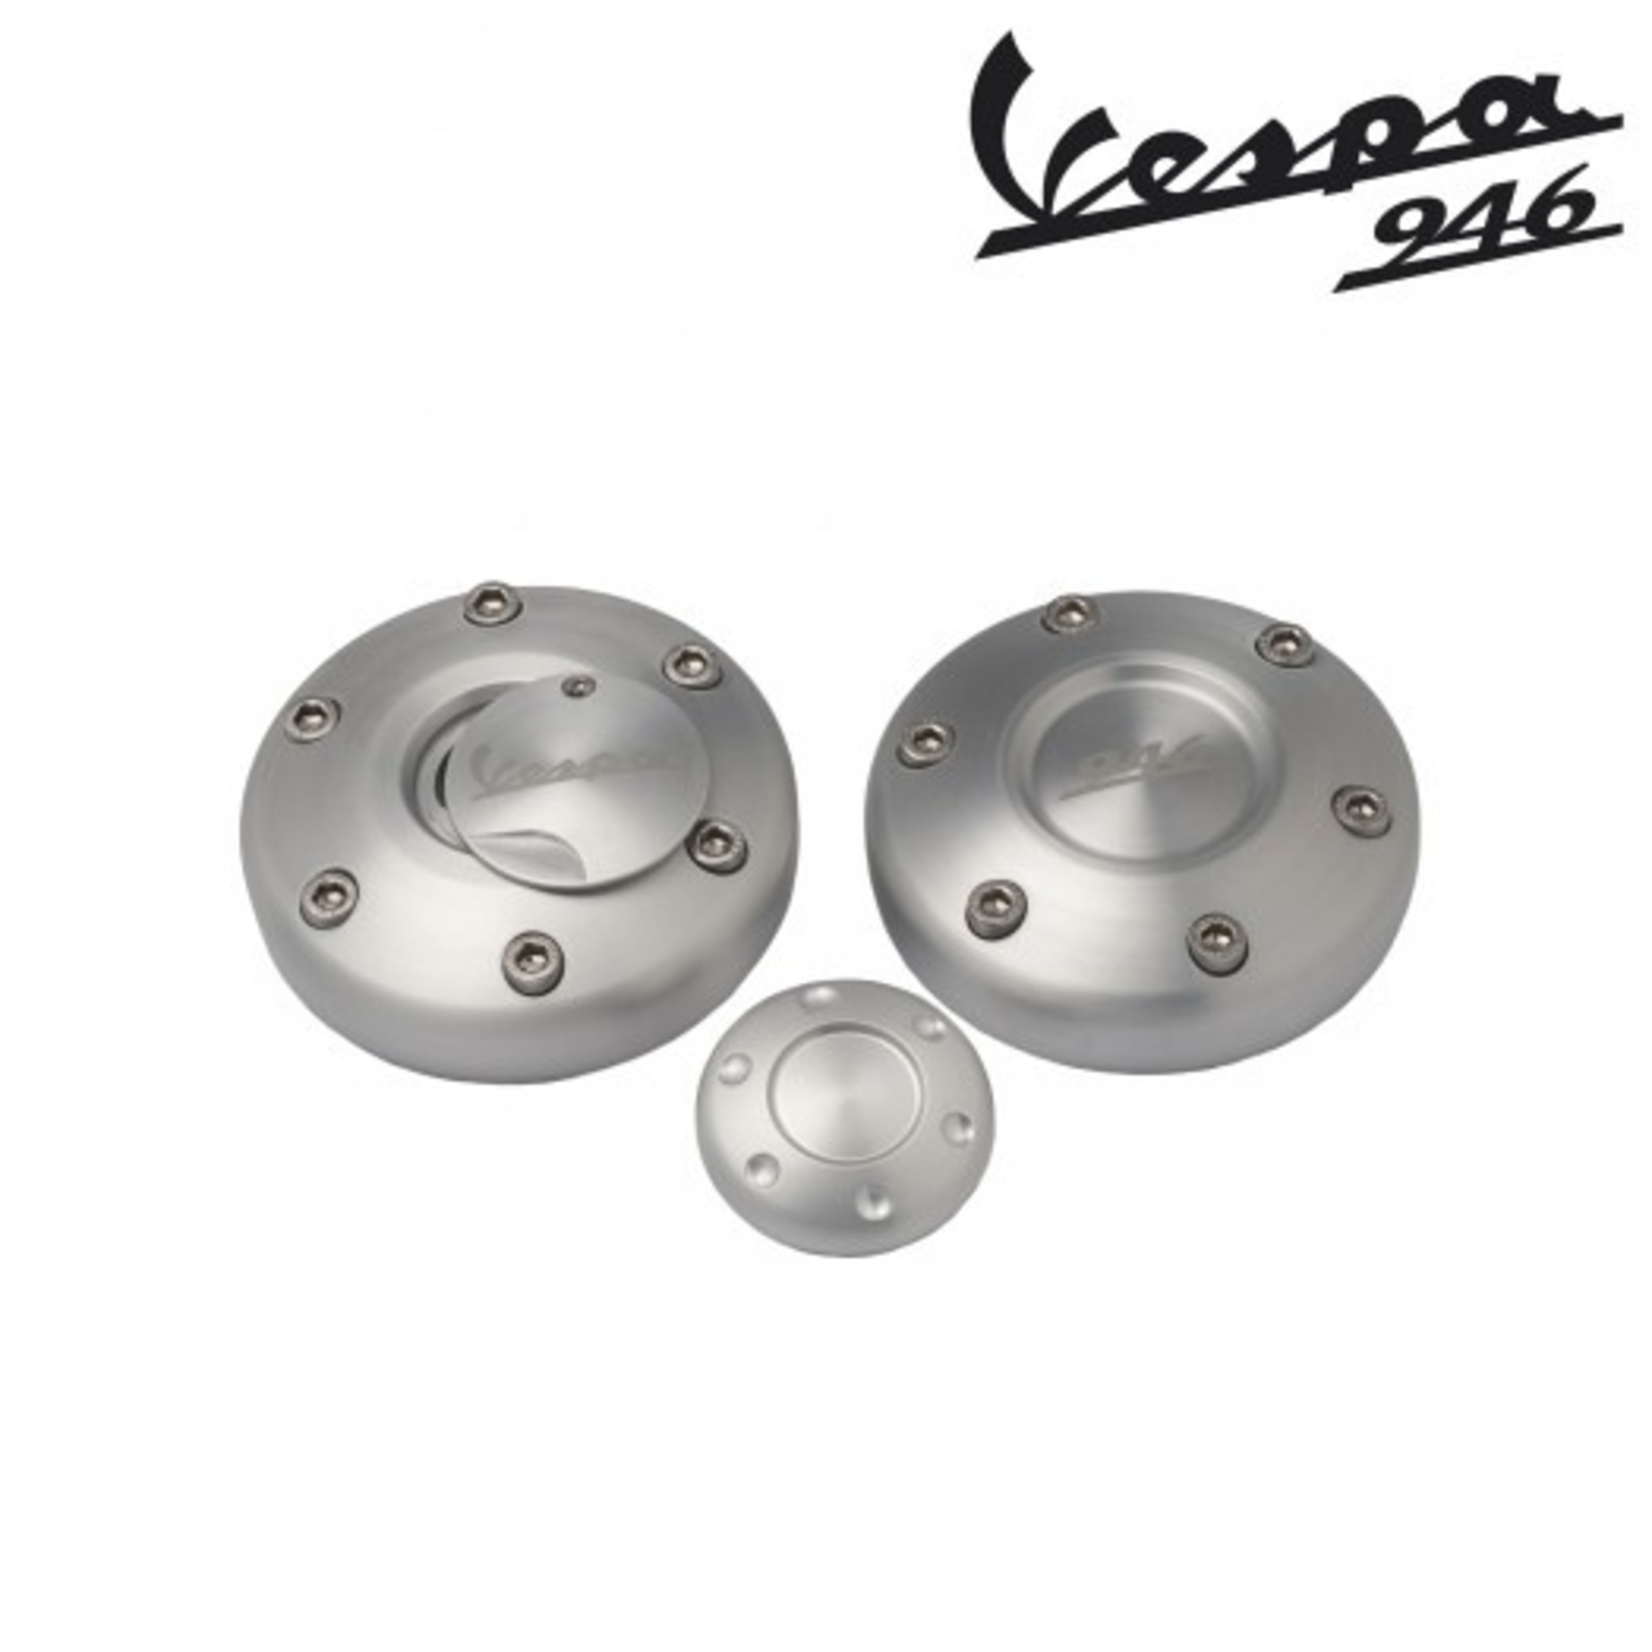 Accessories Billet Aluminum Covers, Vespa 946